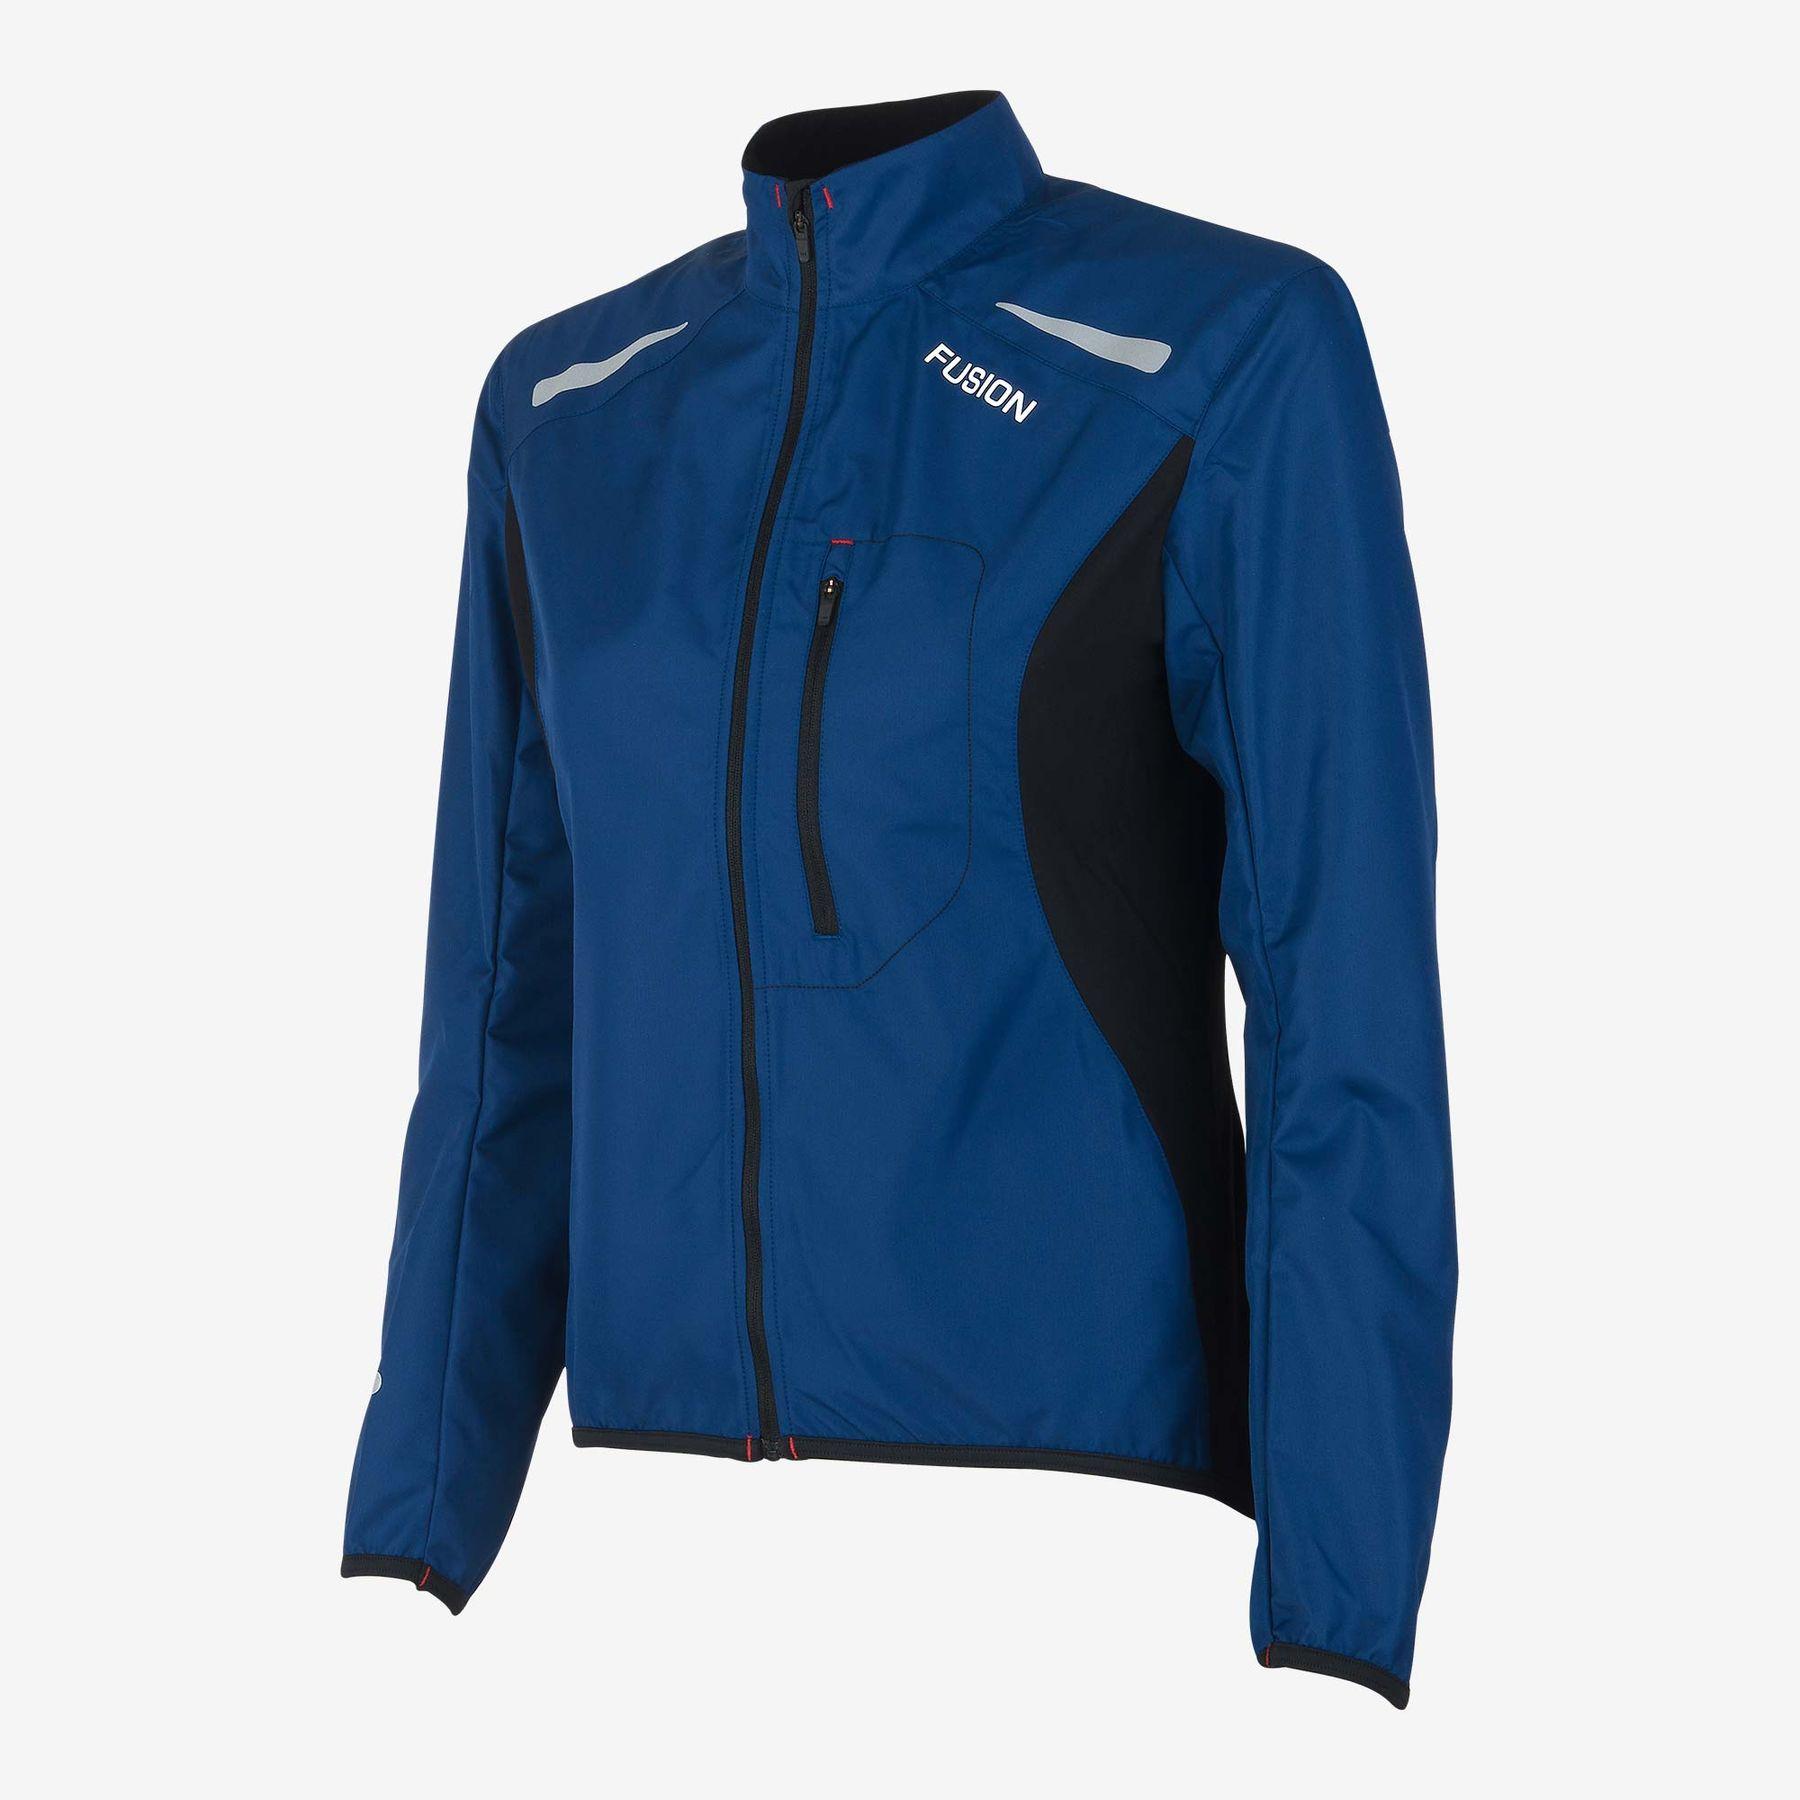 Fusion Women S1 Run Jacket (Night Blue)